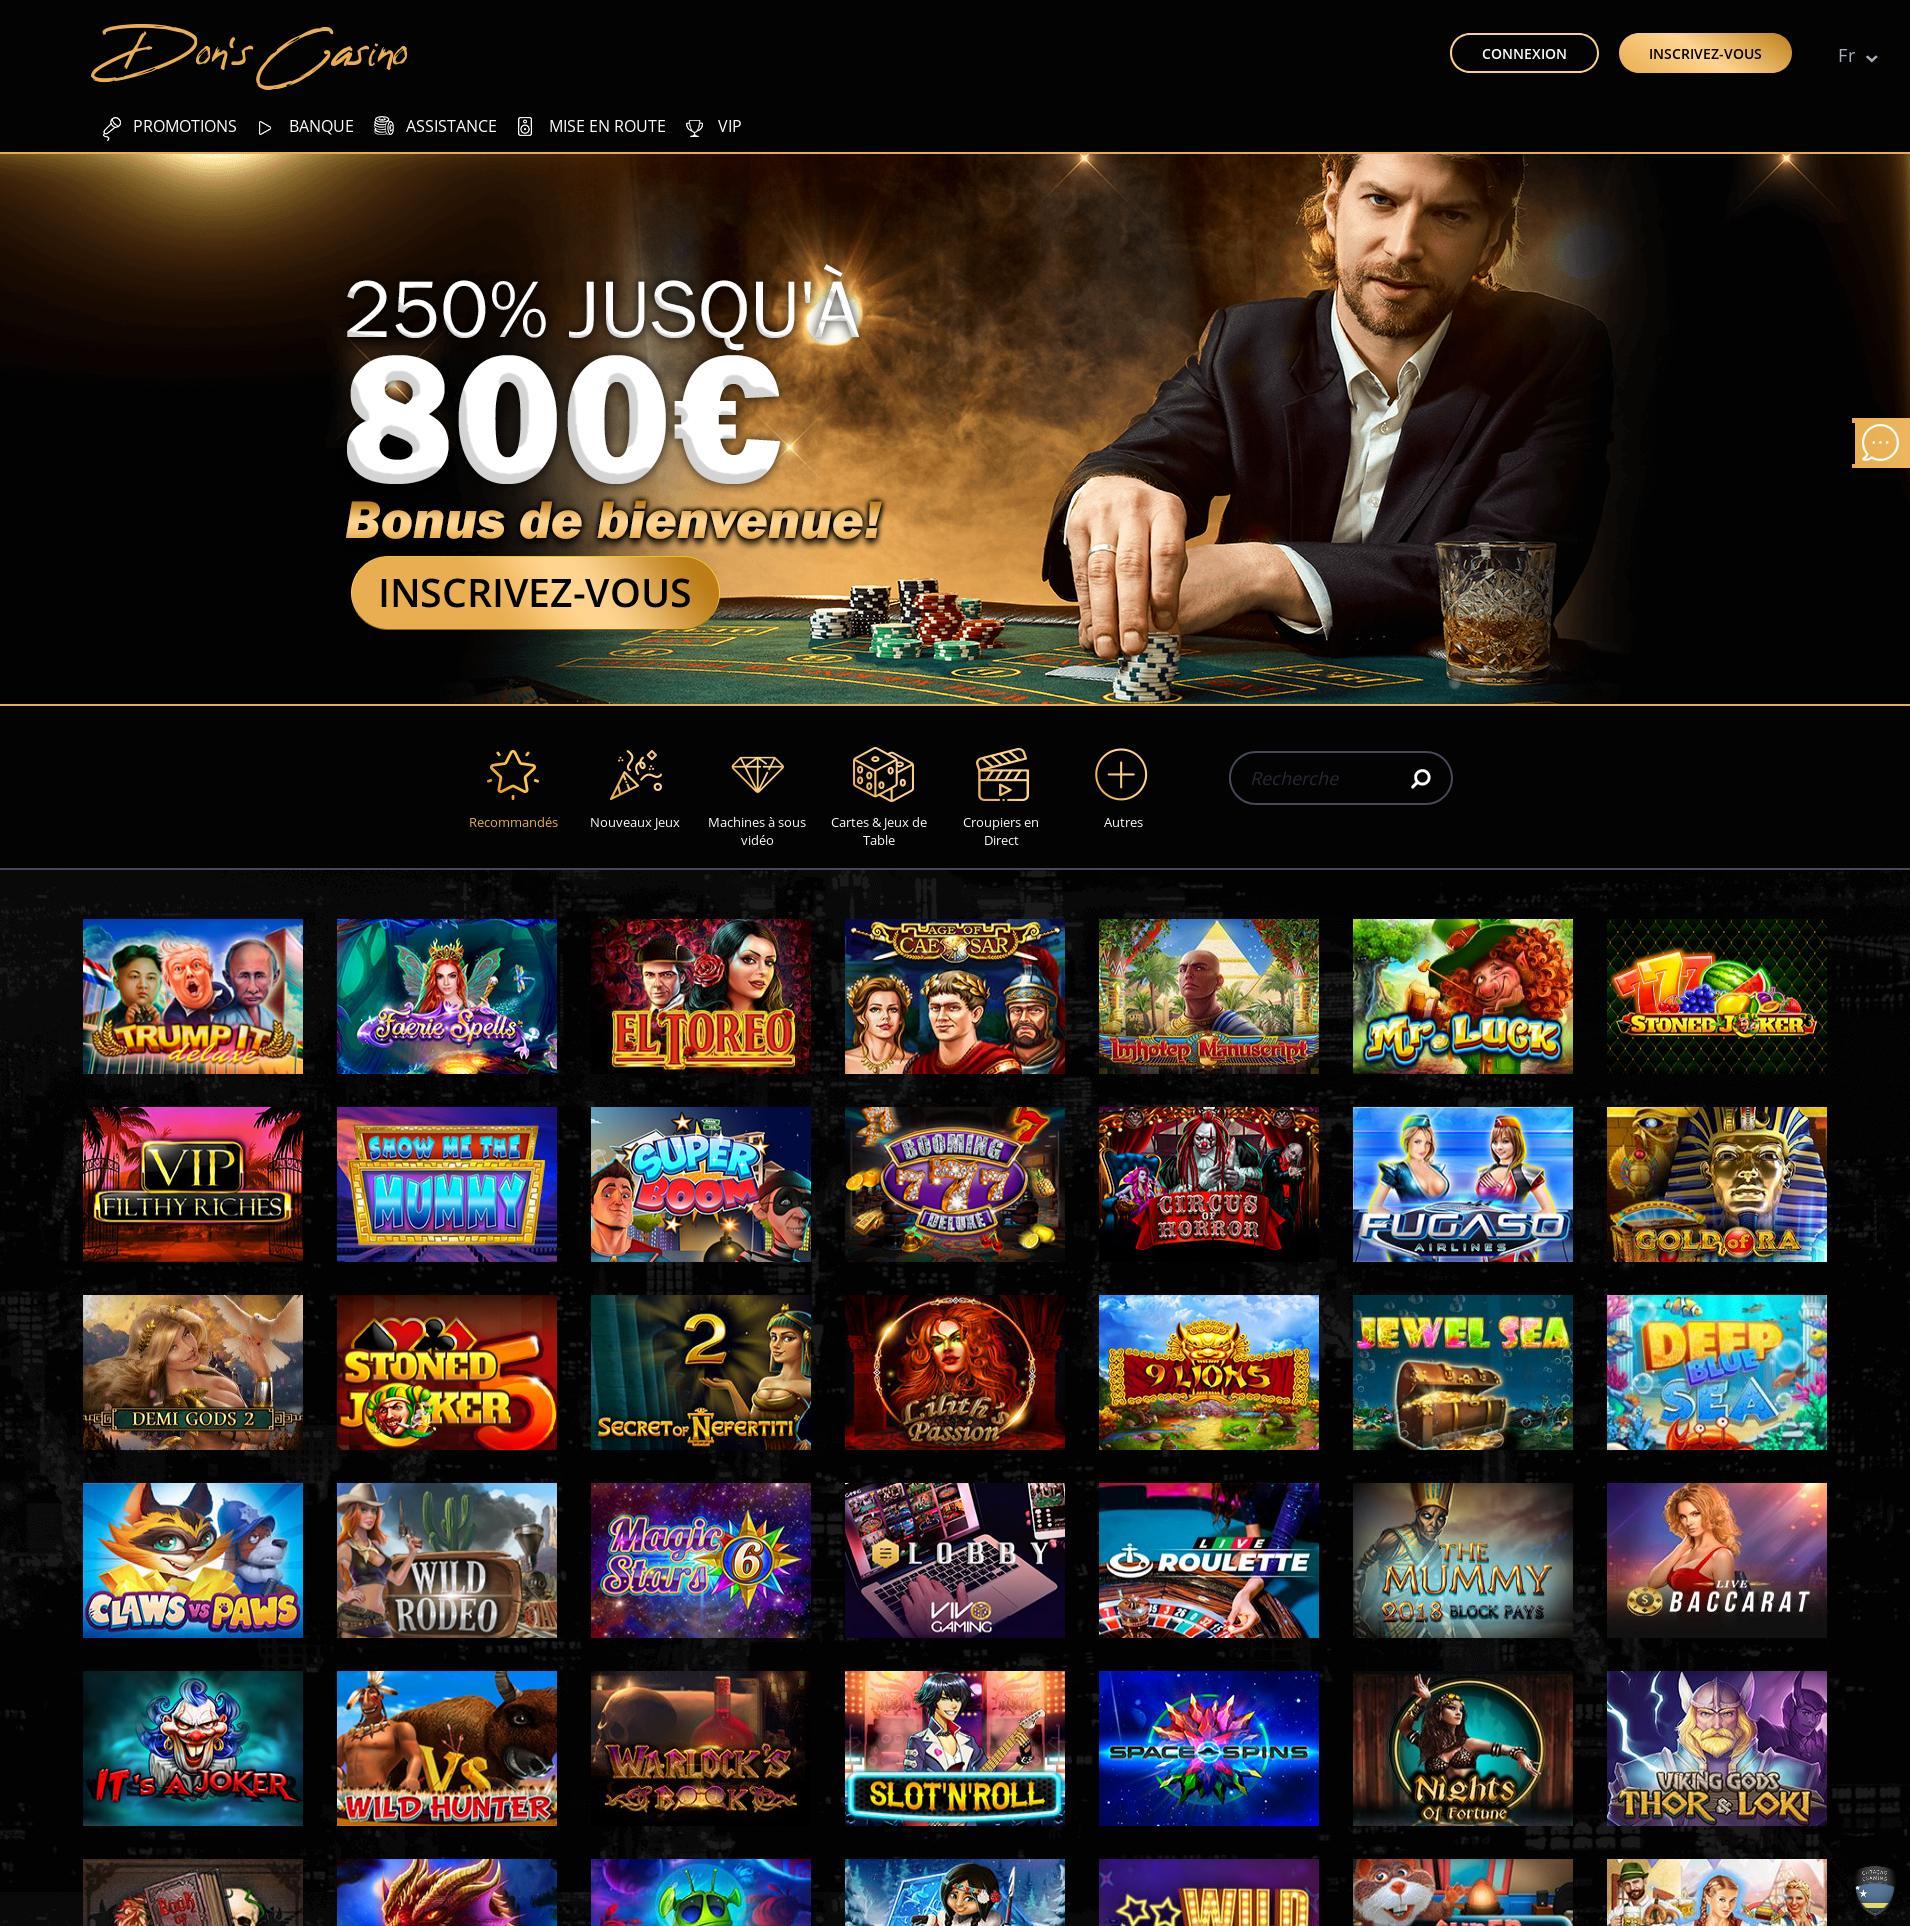 Casino screen Lobby 2019-07-17 for France